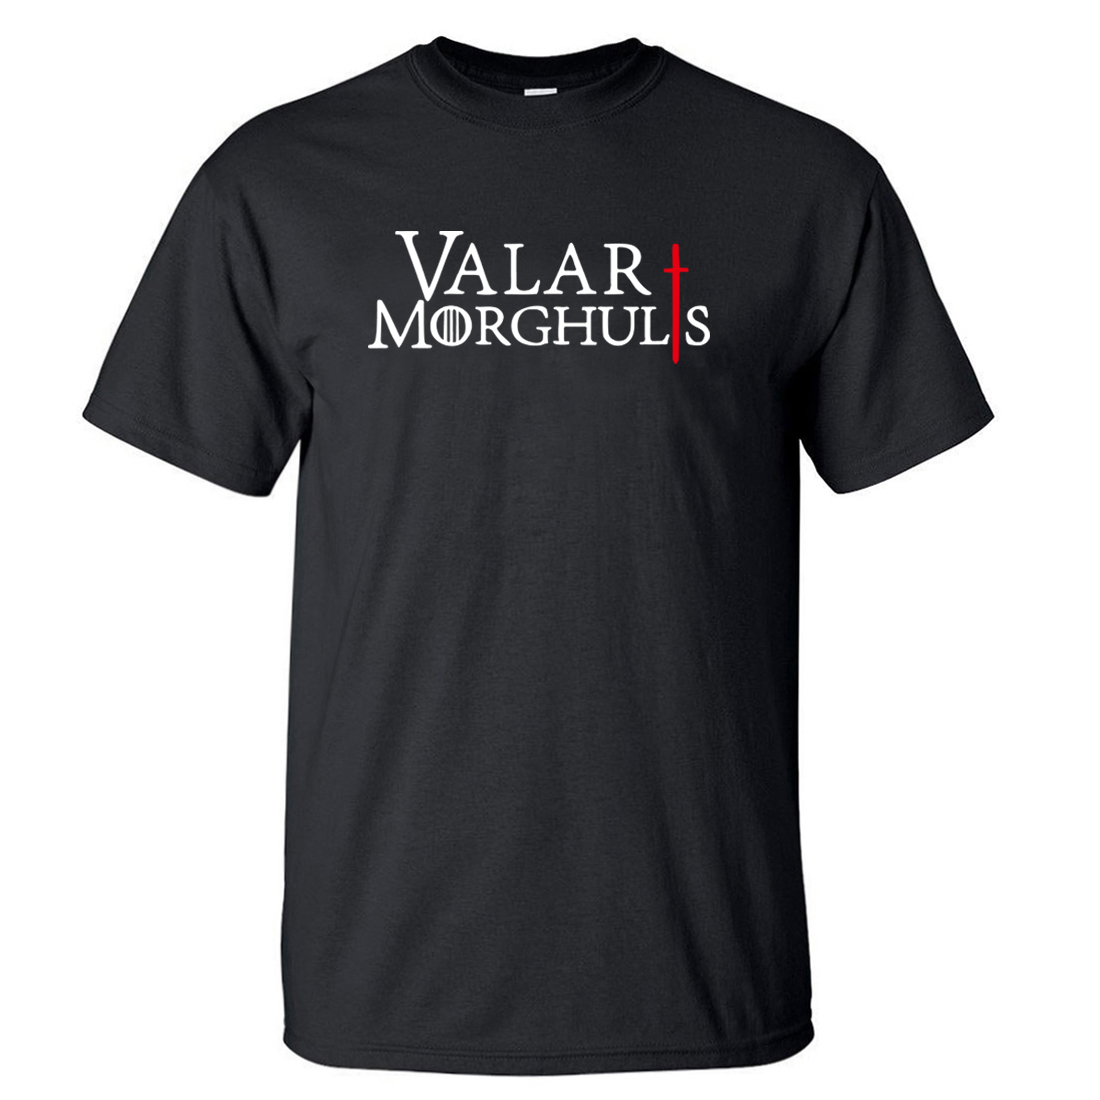 Game Of Thrones Valar Morghulis Men's Top Tees 2018 Summer Hot Men T Shirts 100% Cotton High Quality Short Sleeve O-Neck T-Shirt